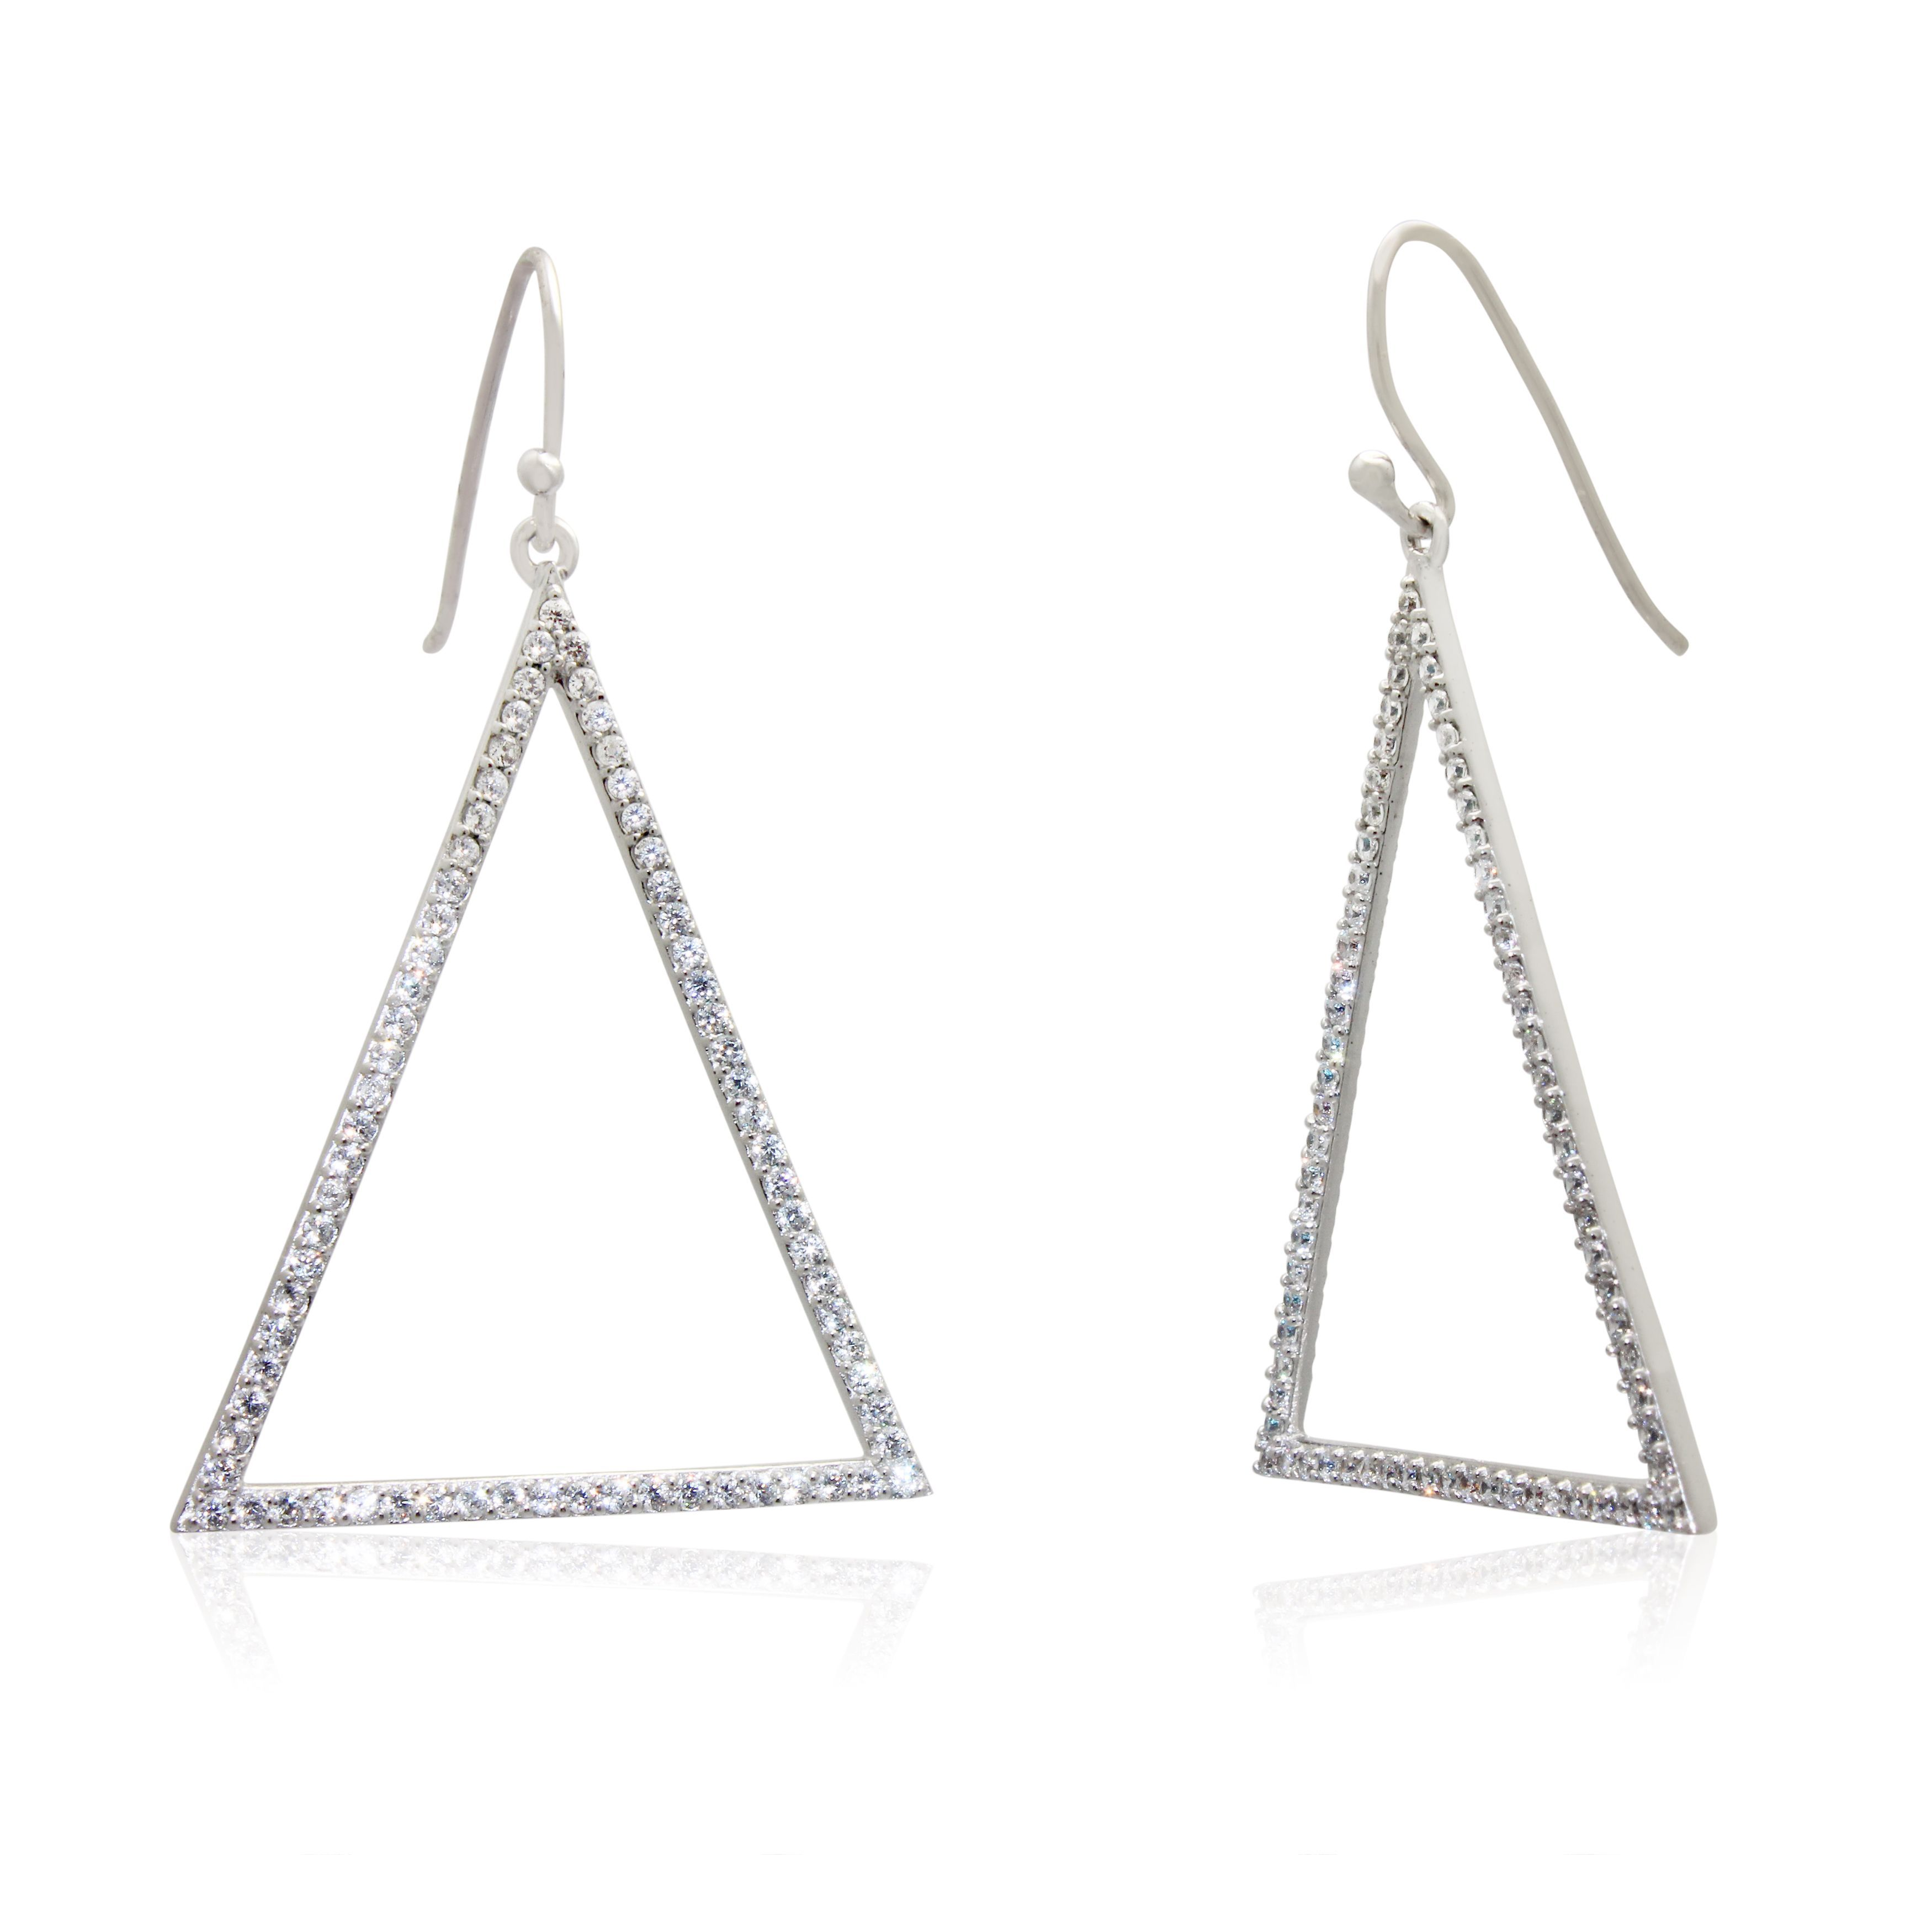 Gioelli Sterling Silver Cubic Zirconia Triangle Dangle Earrings